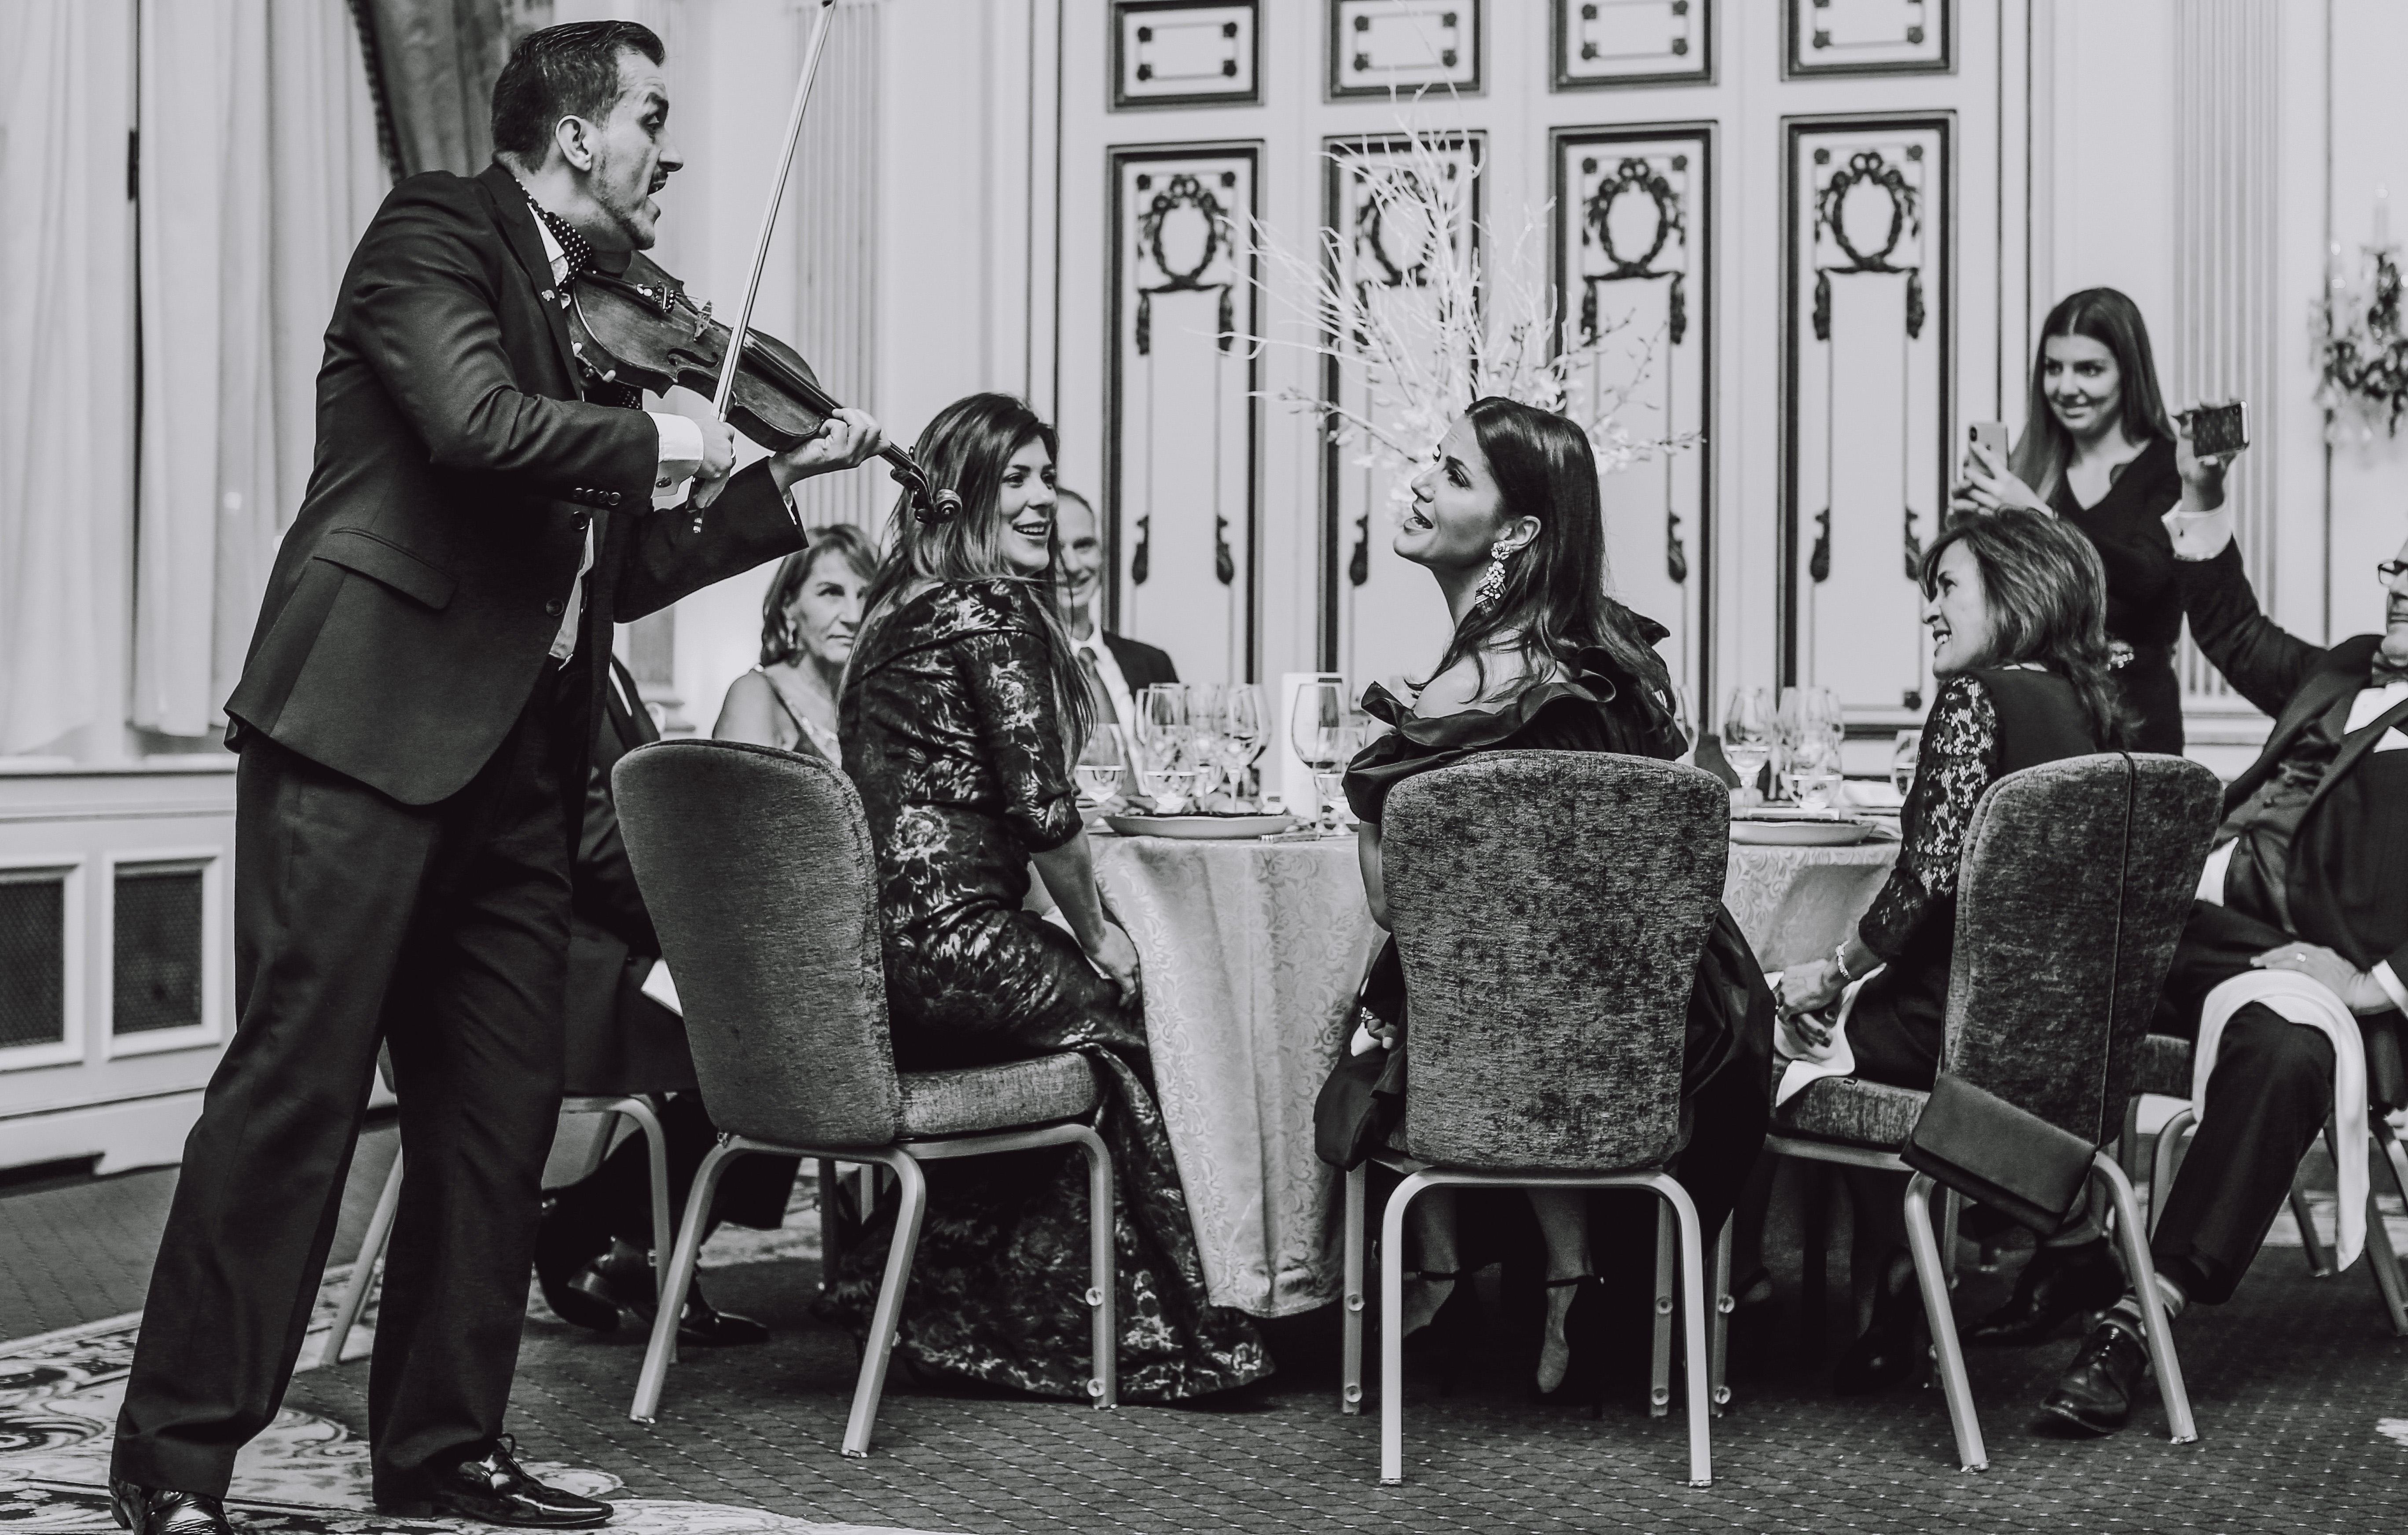 Hon. Marie-France Andre, Kristal Powell, Eleni Korani and Ana Maria Reategui